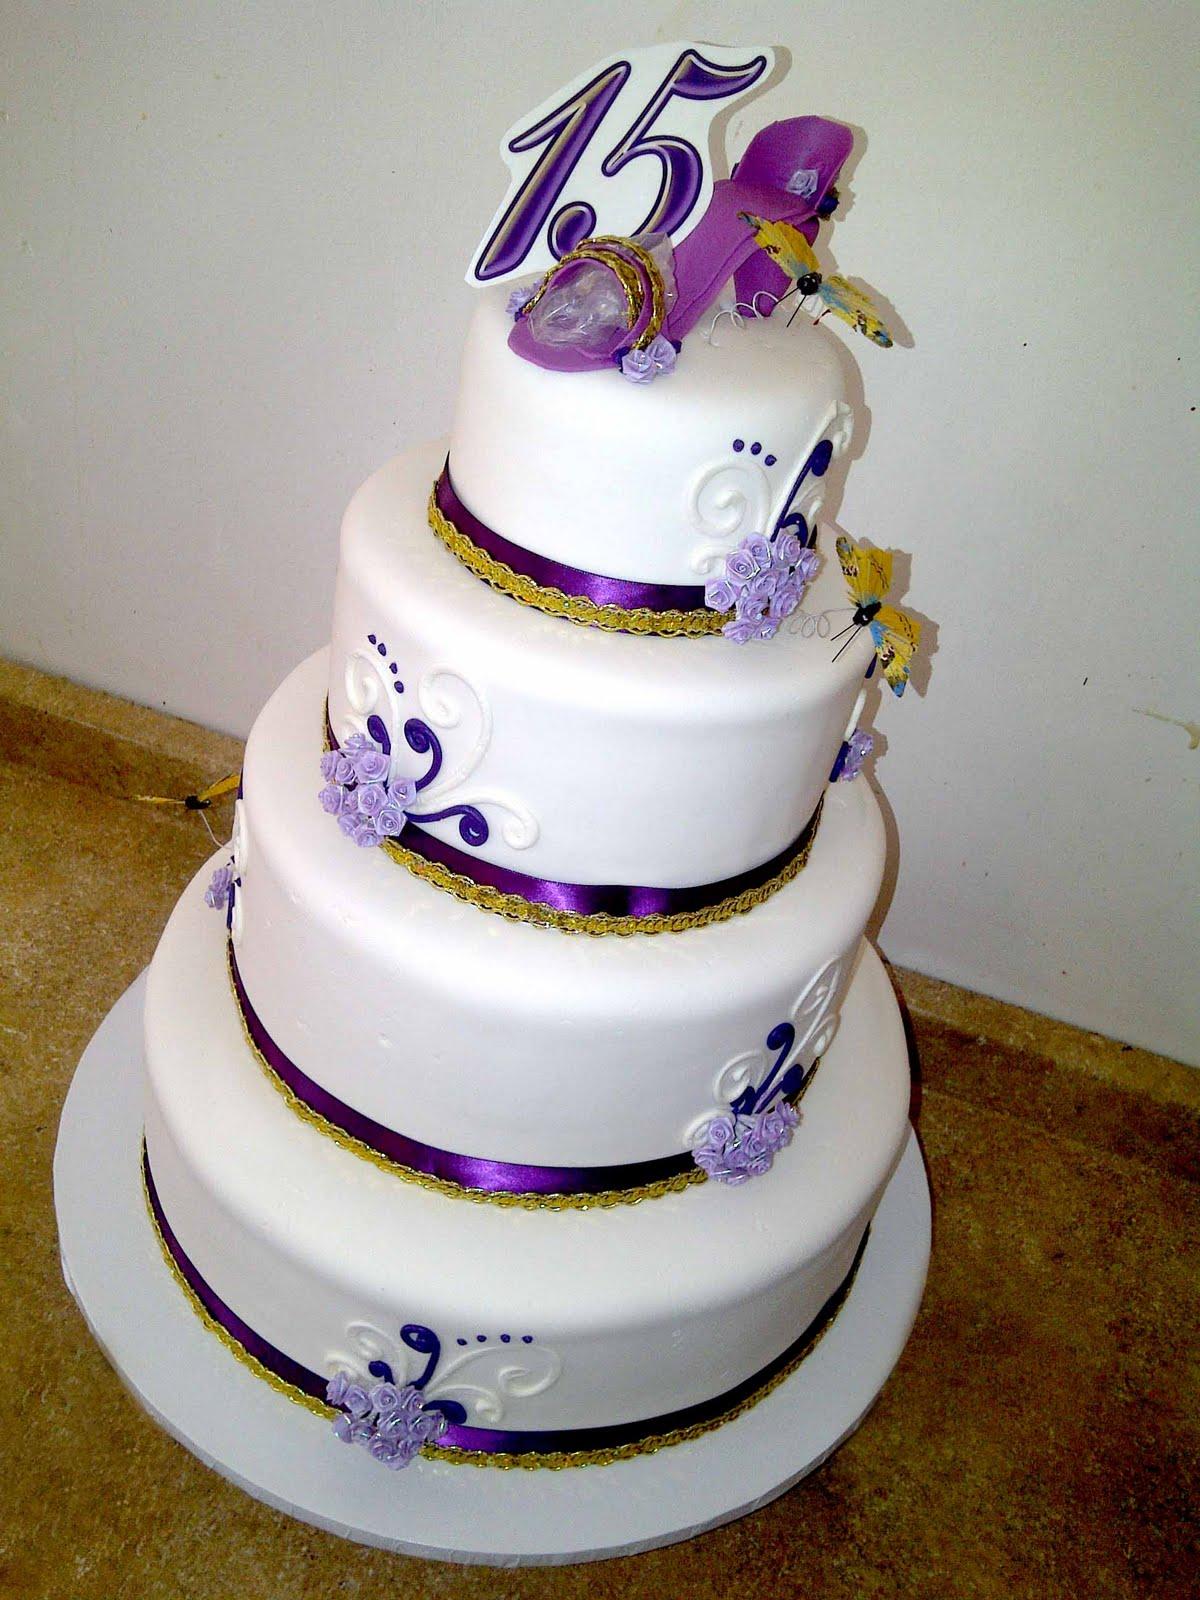 Hector S Custom Cakes Quinceanera Cake